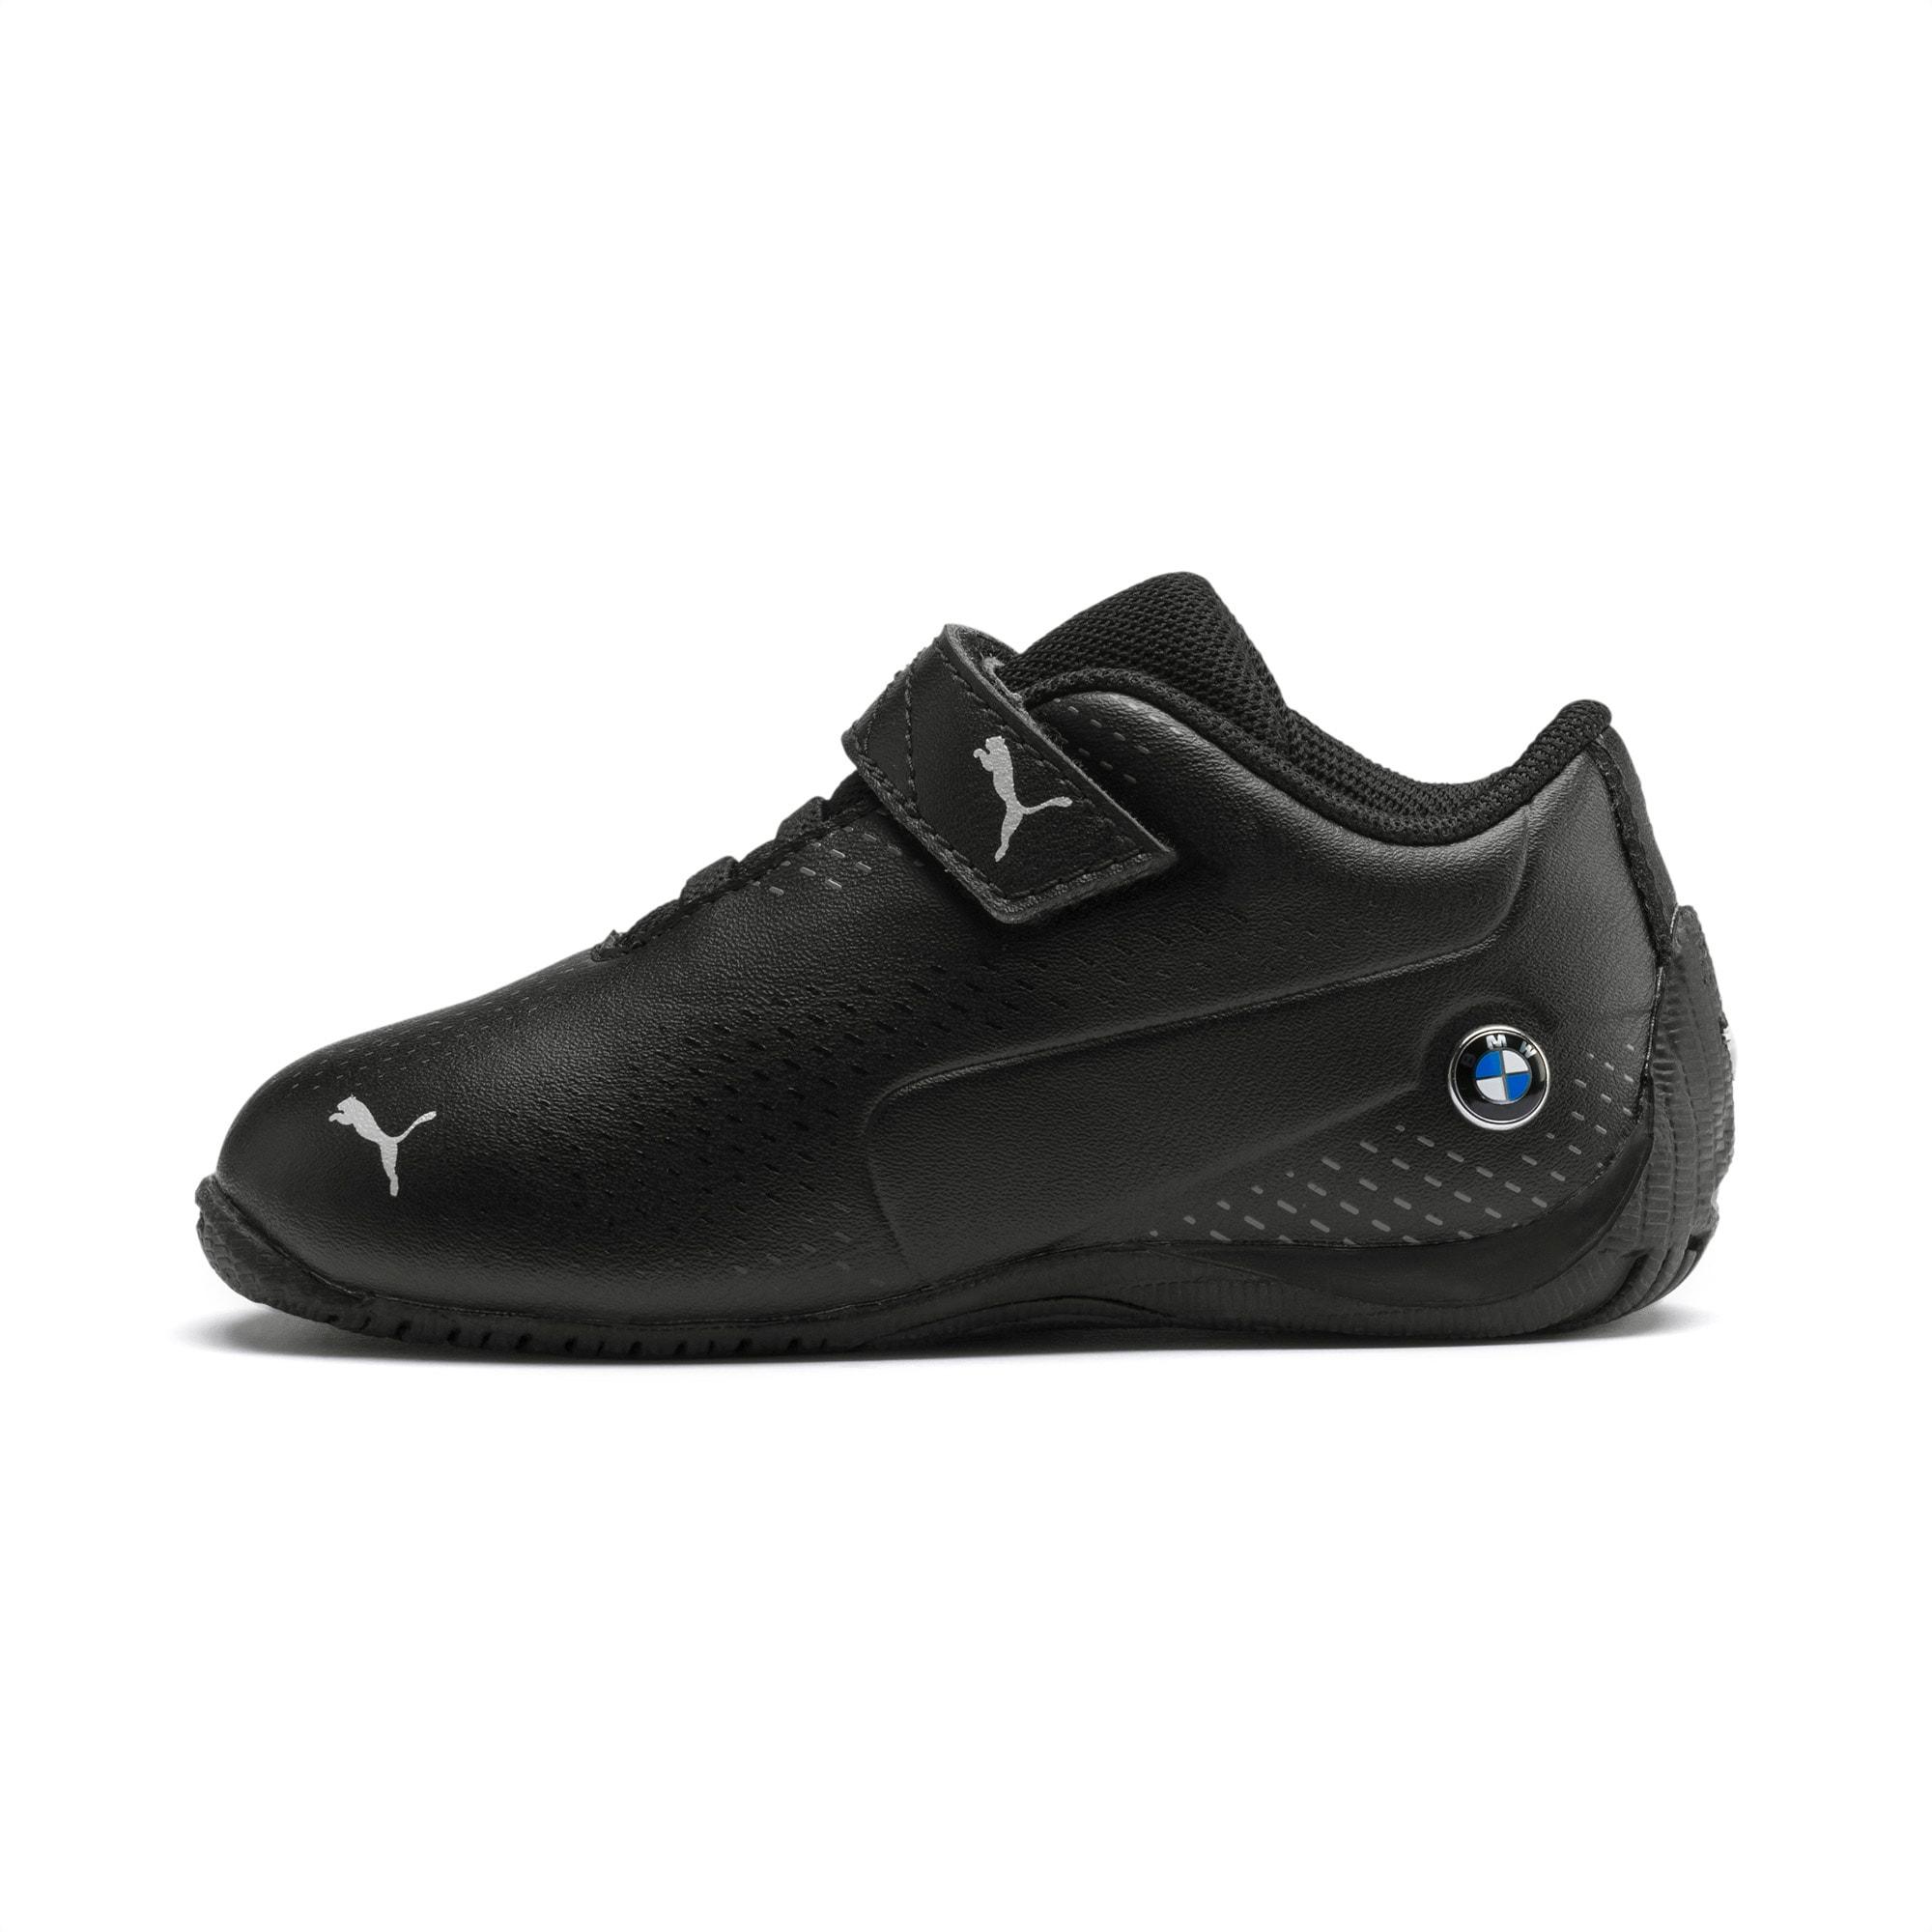 BMW M Motorsport Drift Cat 5 Ultra II Toddler Shoes